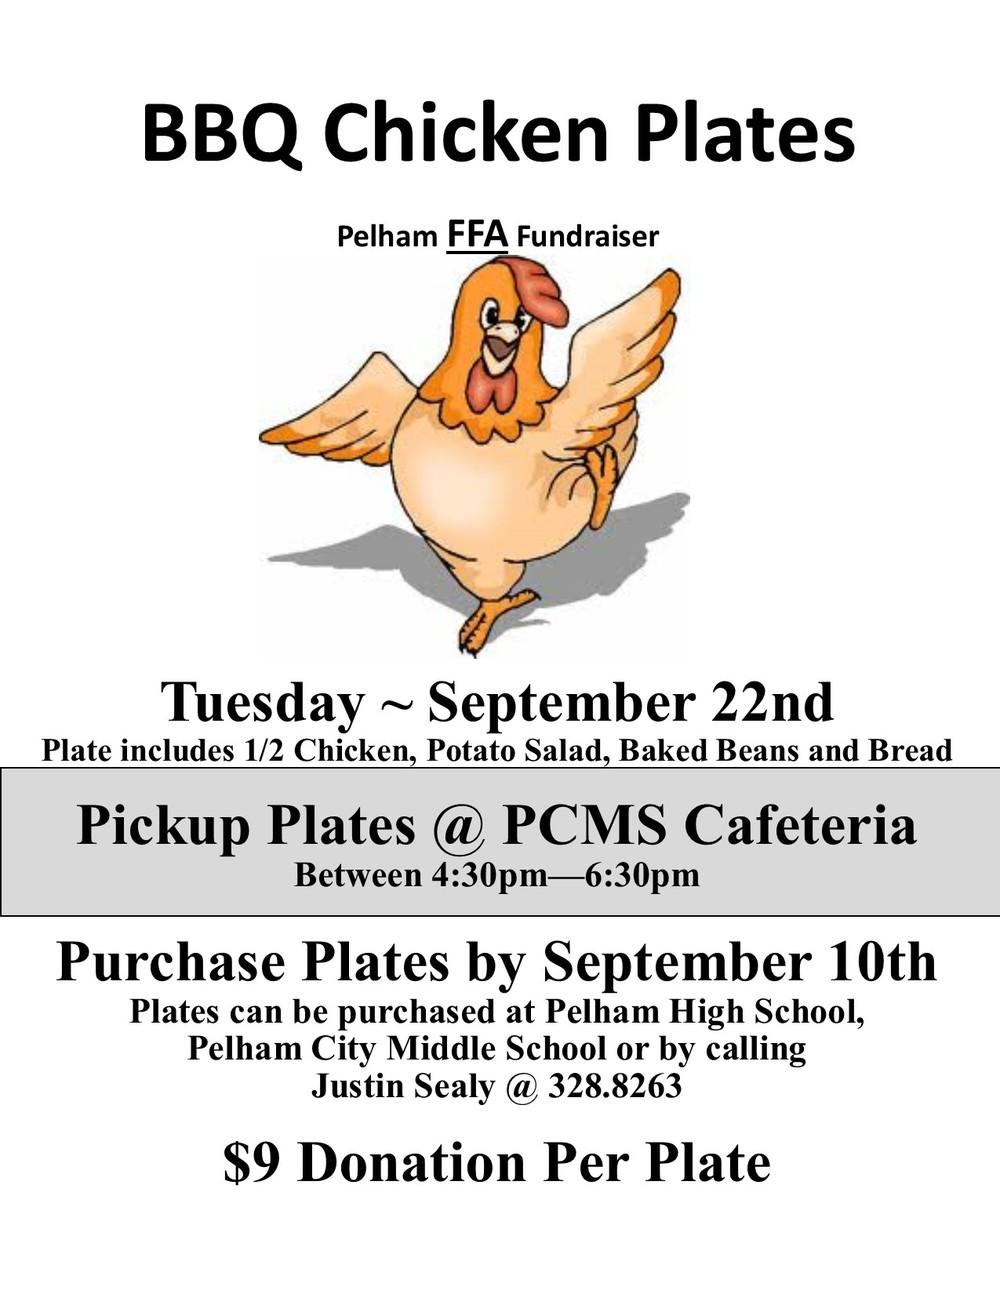 ffa chicken flyer.jpg